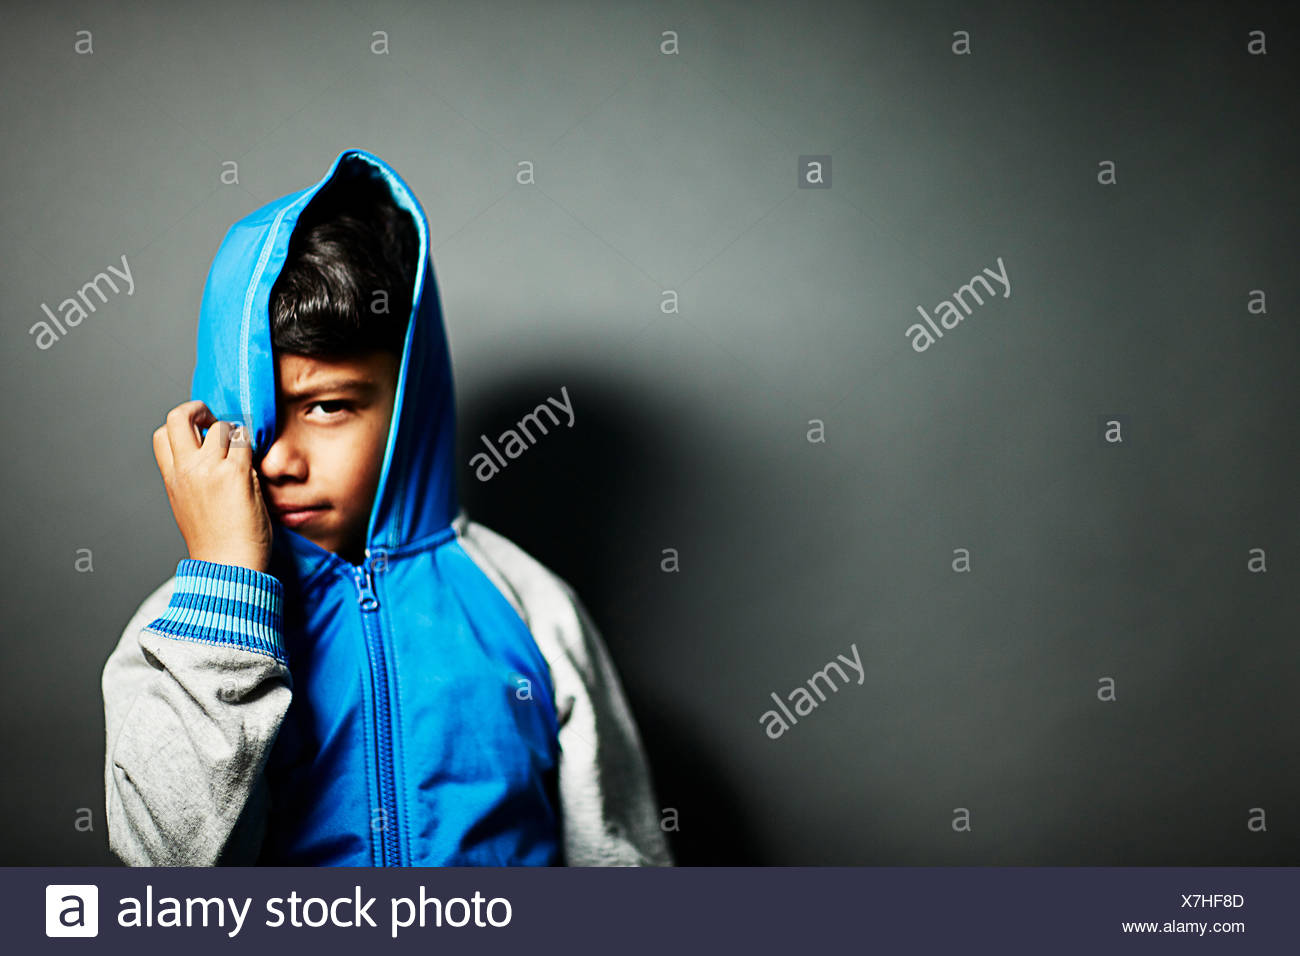 Boy wearing hooded top - Stock Image